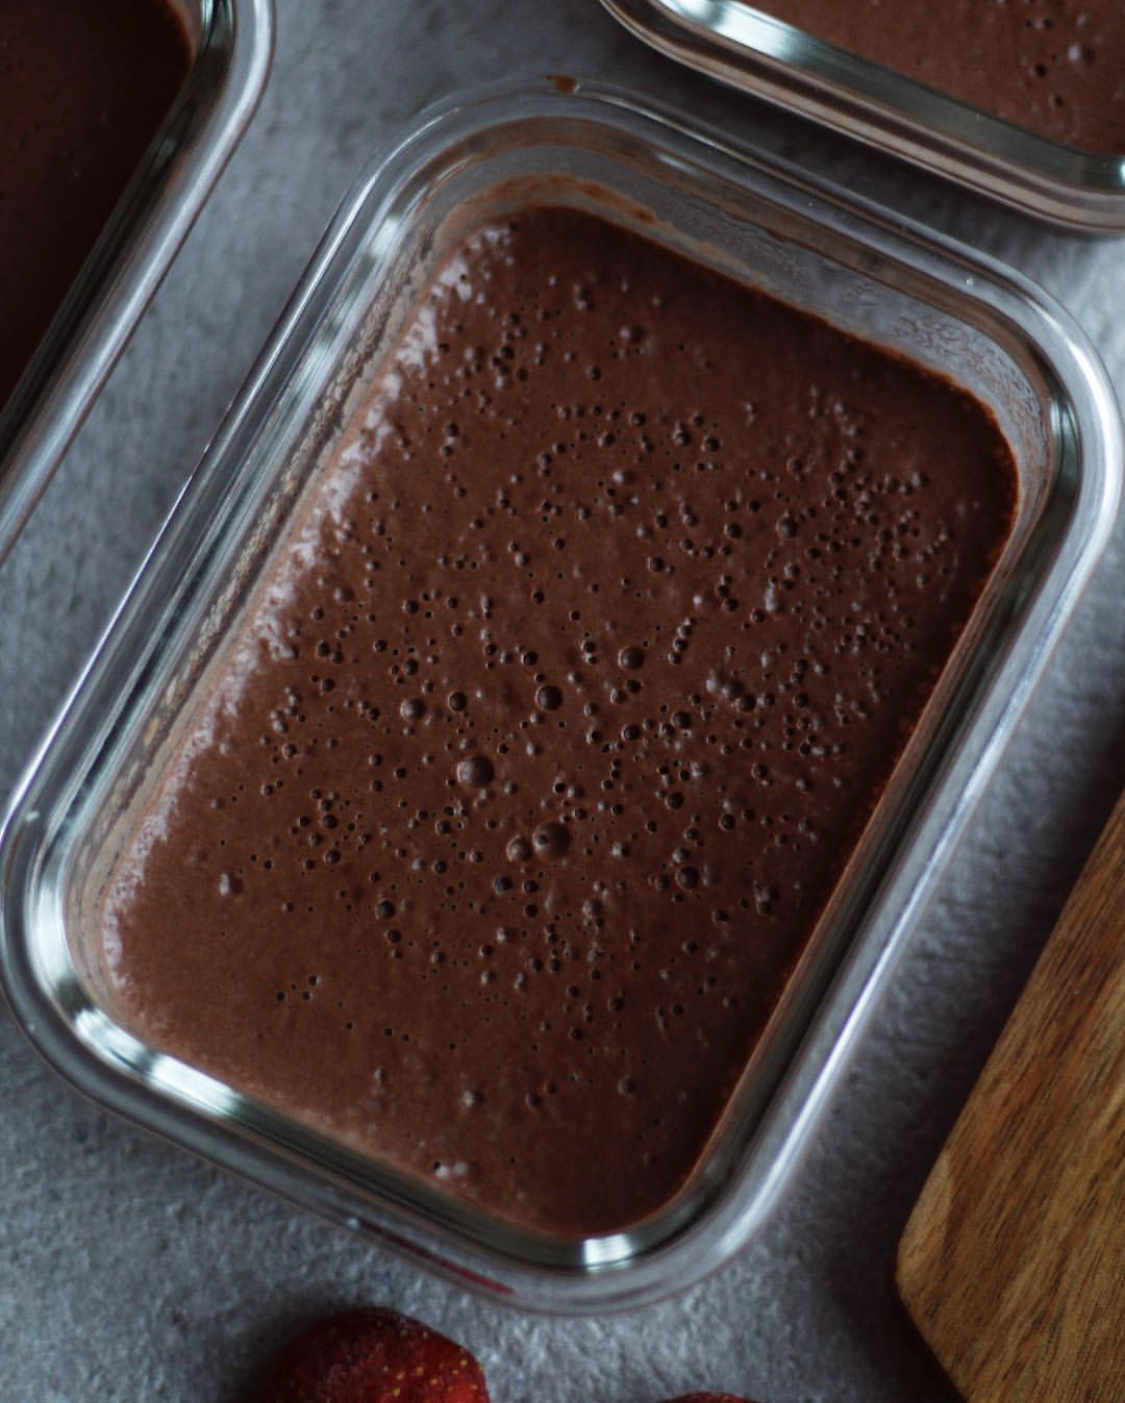 ekotipset chiachokladpudding